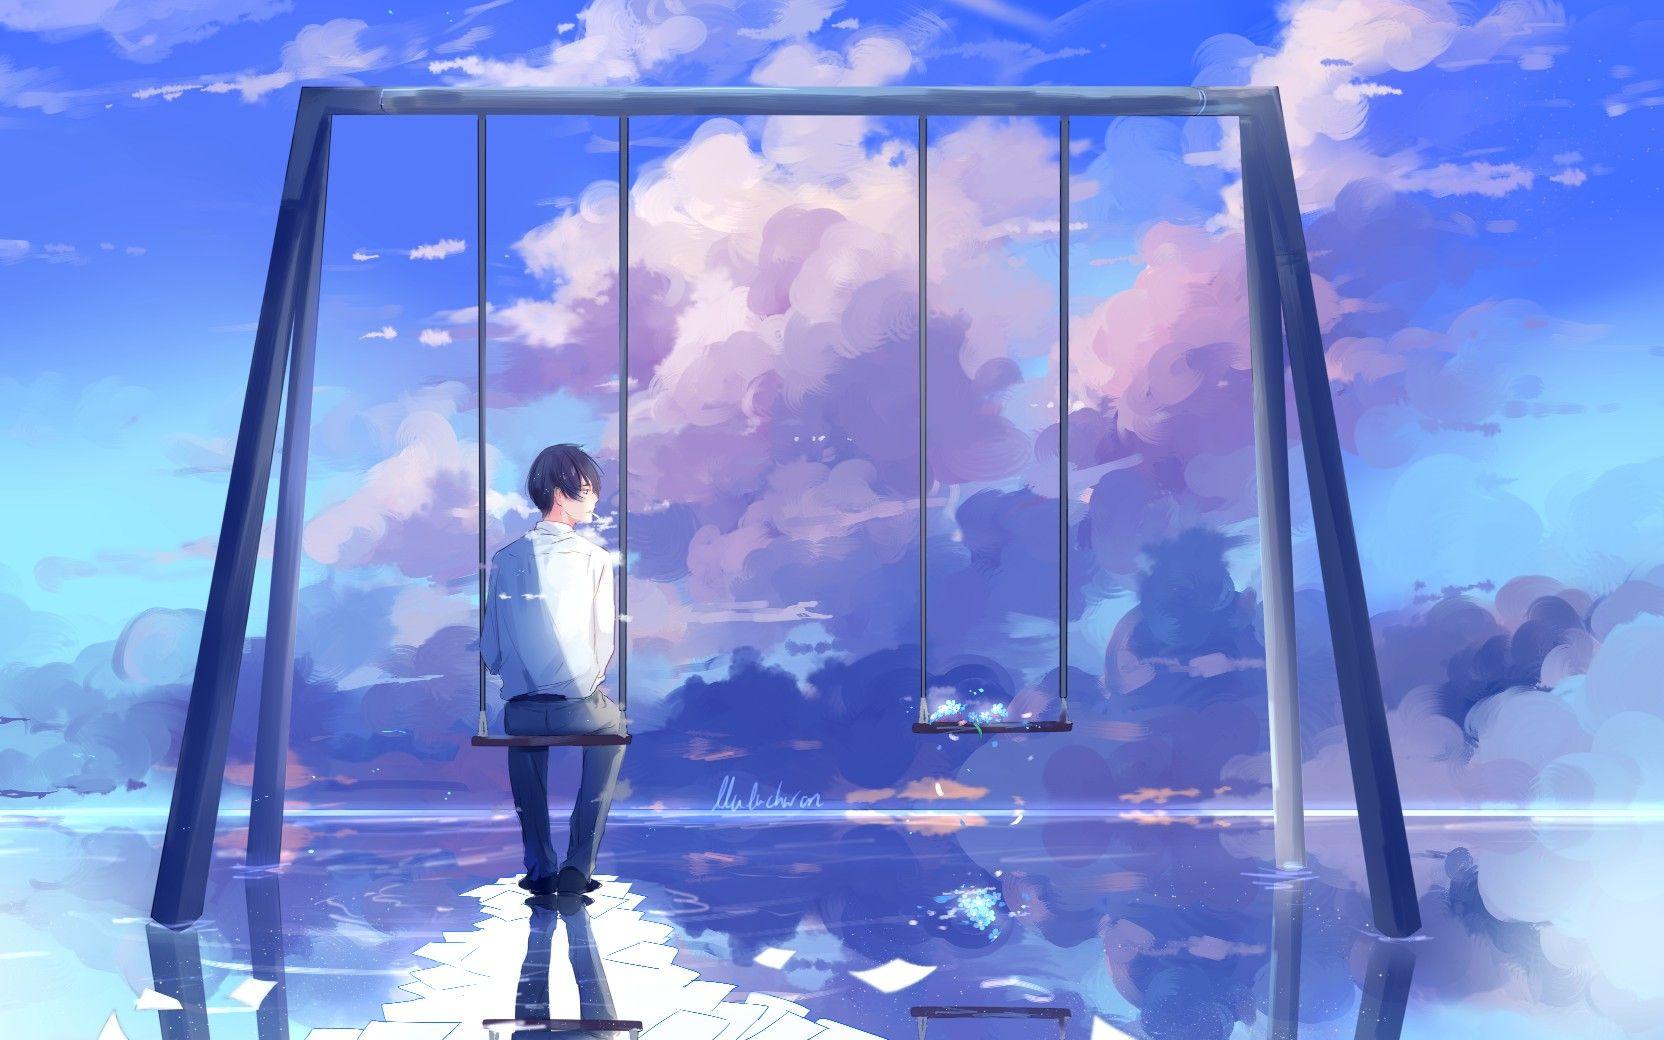 Anime Lluluchwan Art Animeboy Handsome Artist Drawings Anime Cover Photo Anime Anime Art Beautiful